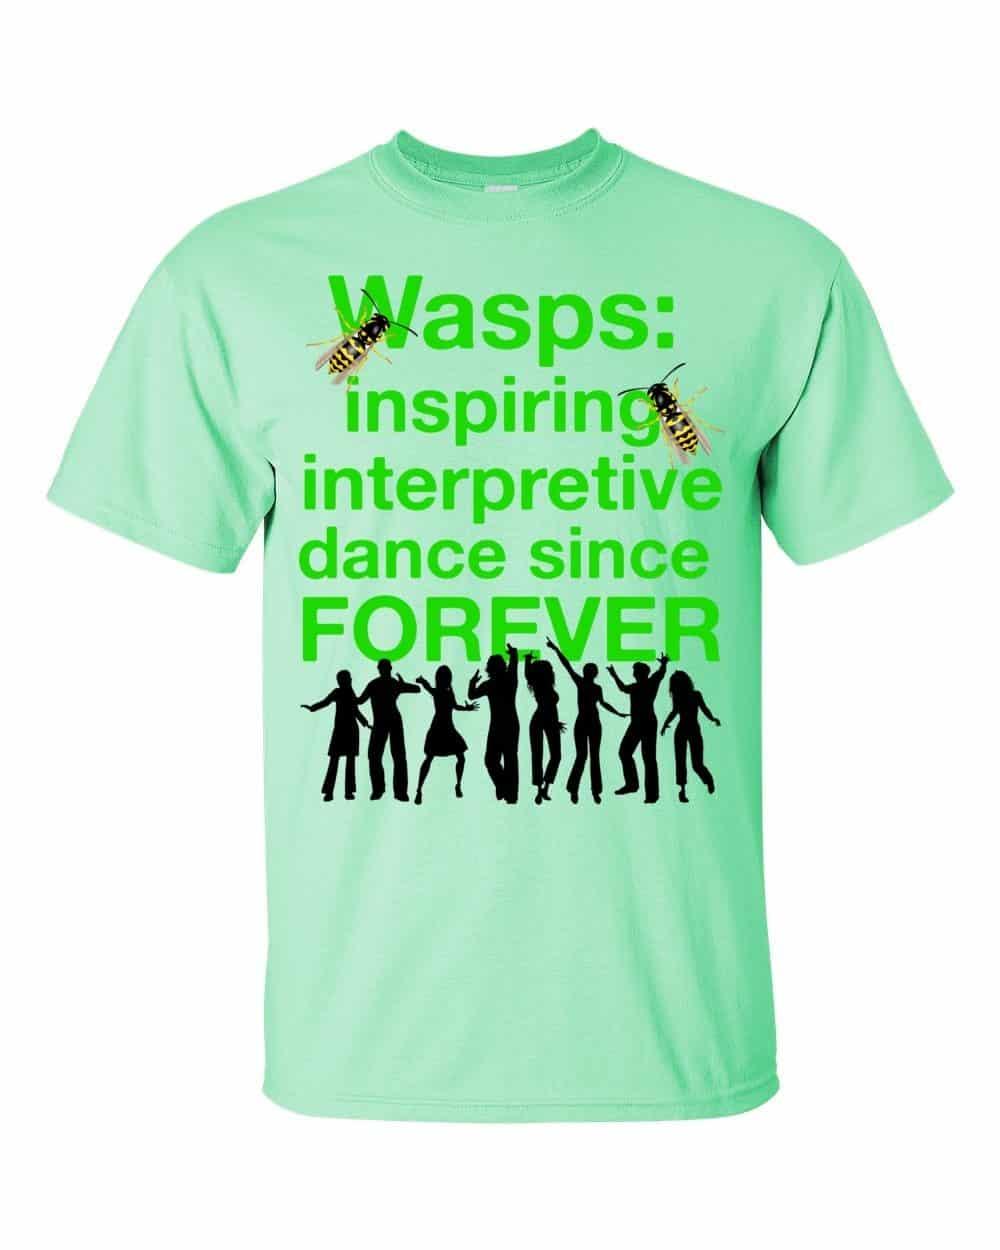 Wasps Inspire Interpretive Dance T-Shirt (mint)